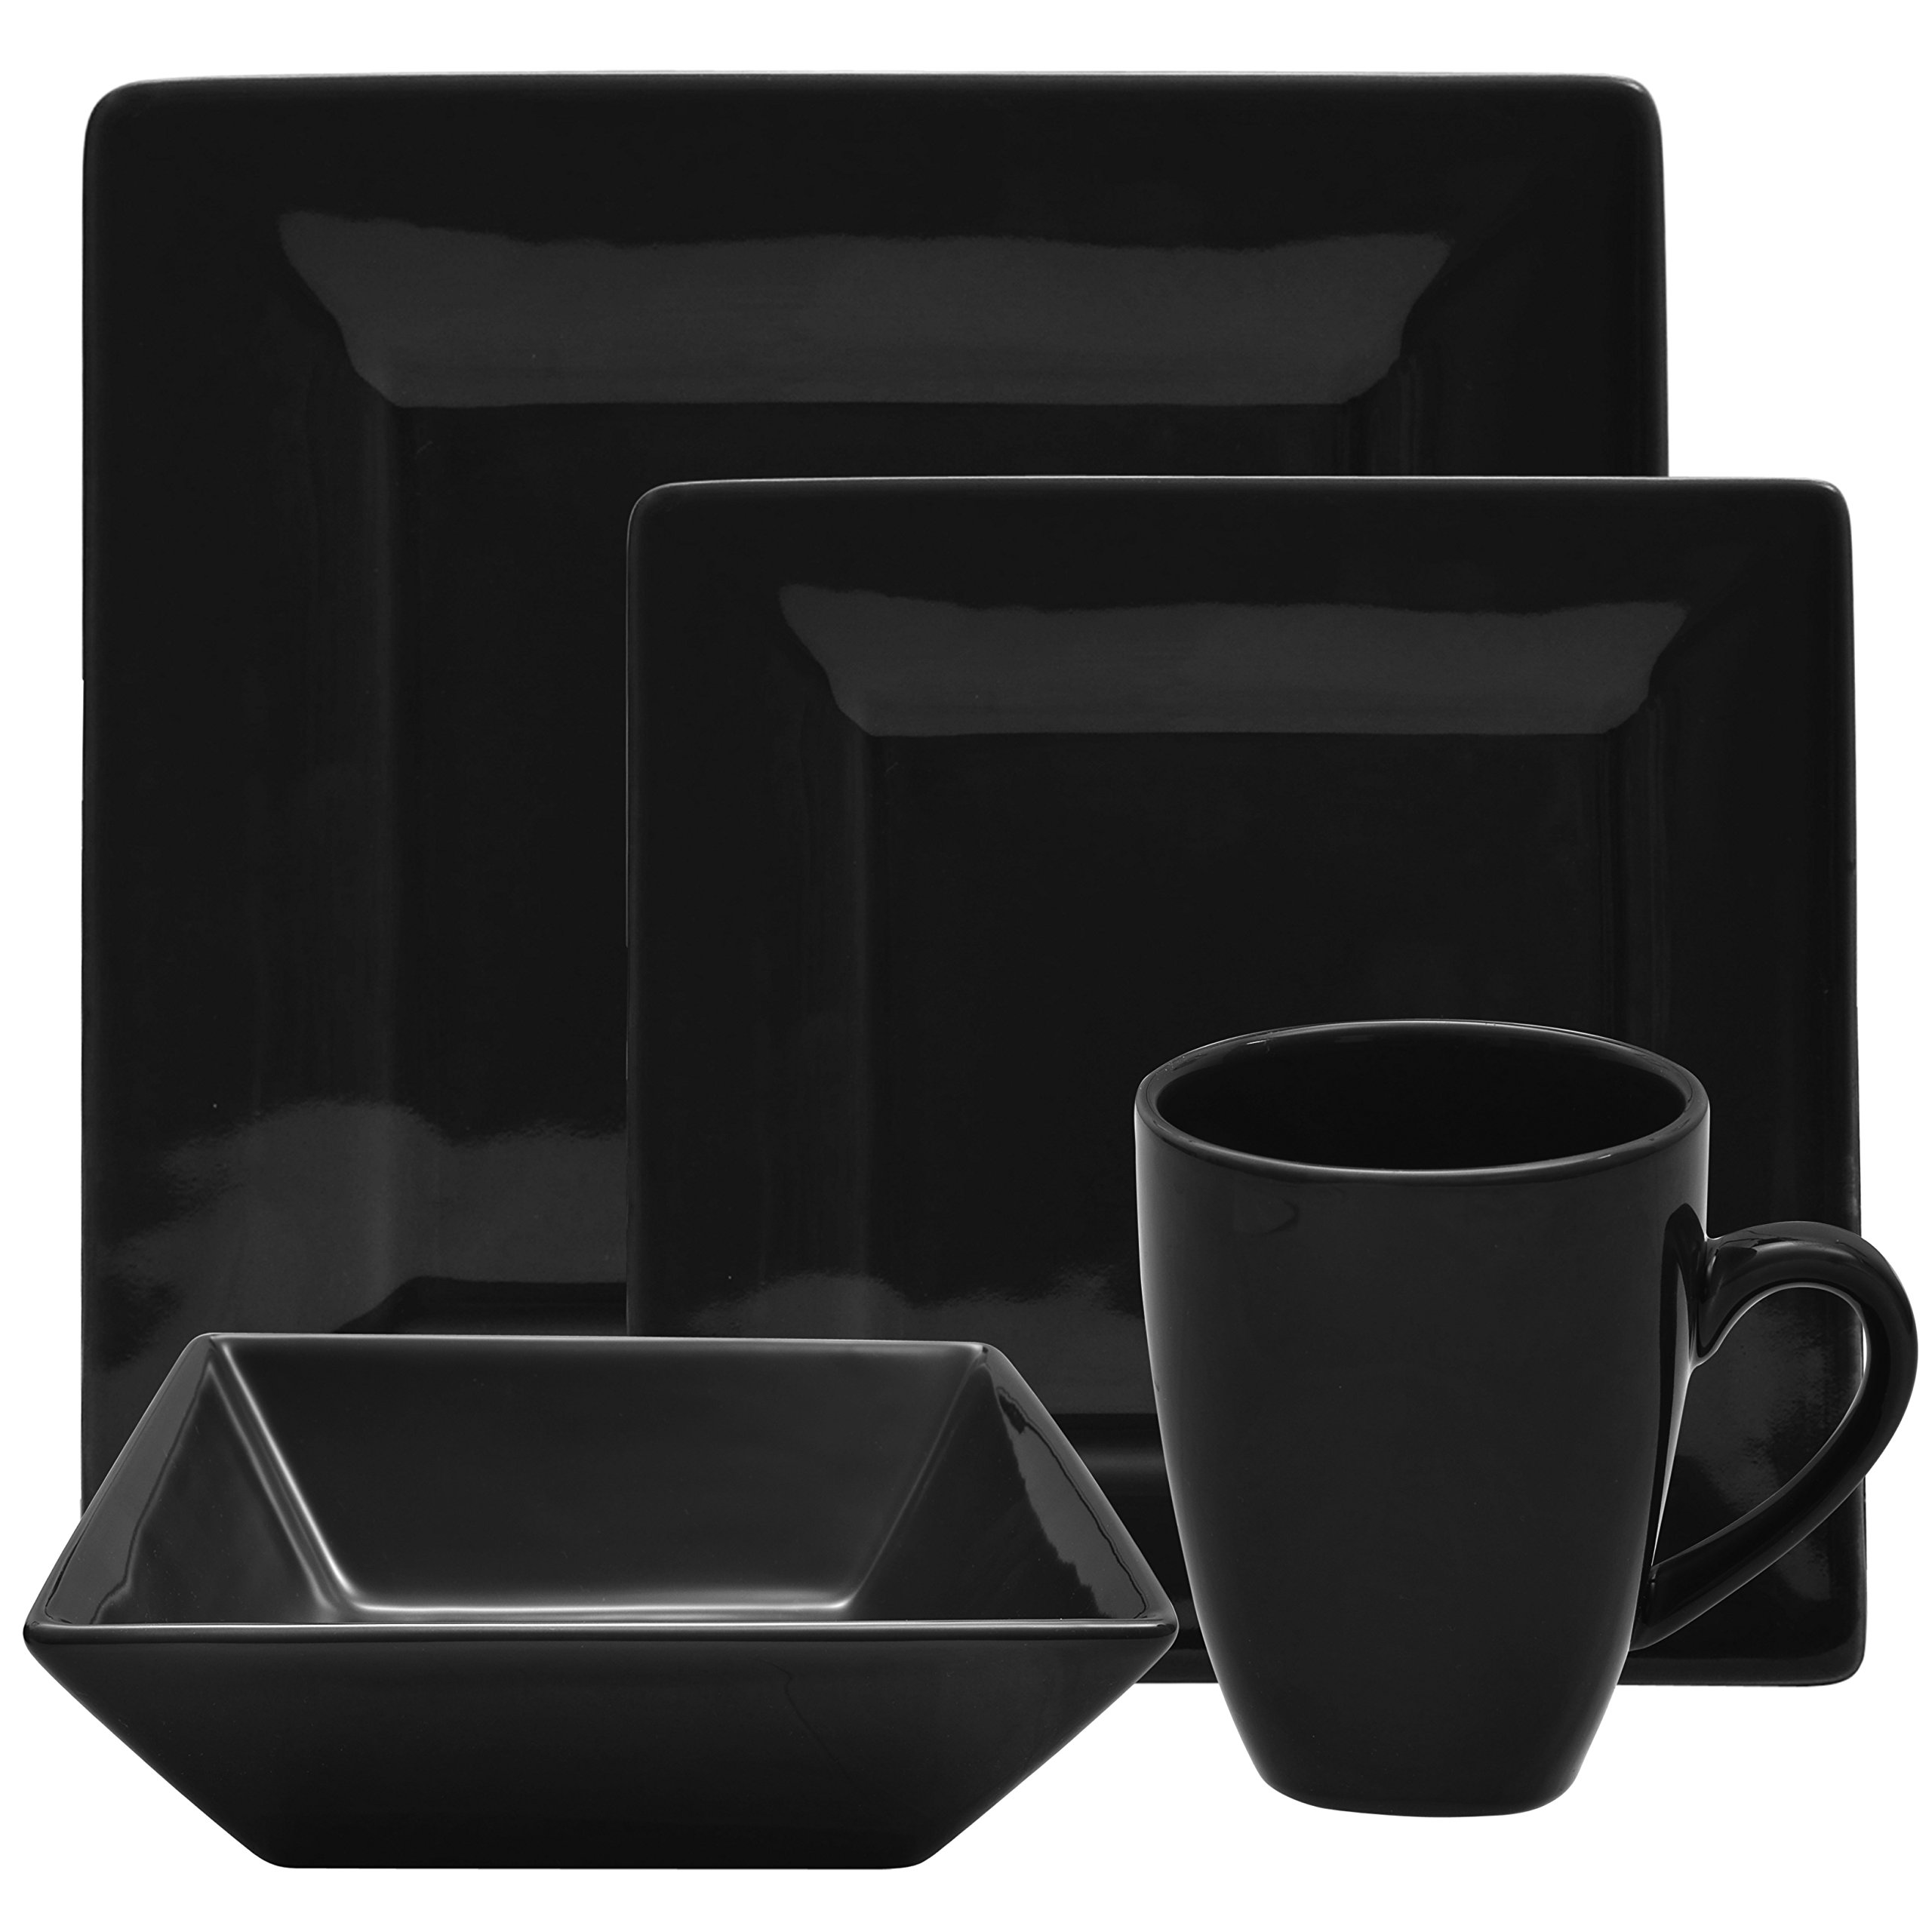 10 Strawberry Street Square 16 Piece Dinnerware Set, Black by 10 Strawberry Street (Image #1)